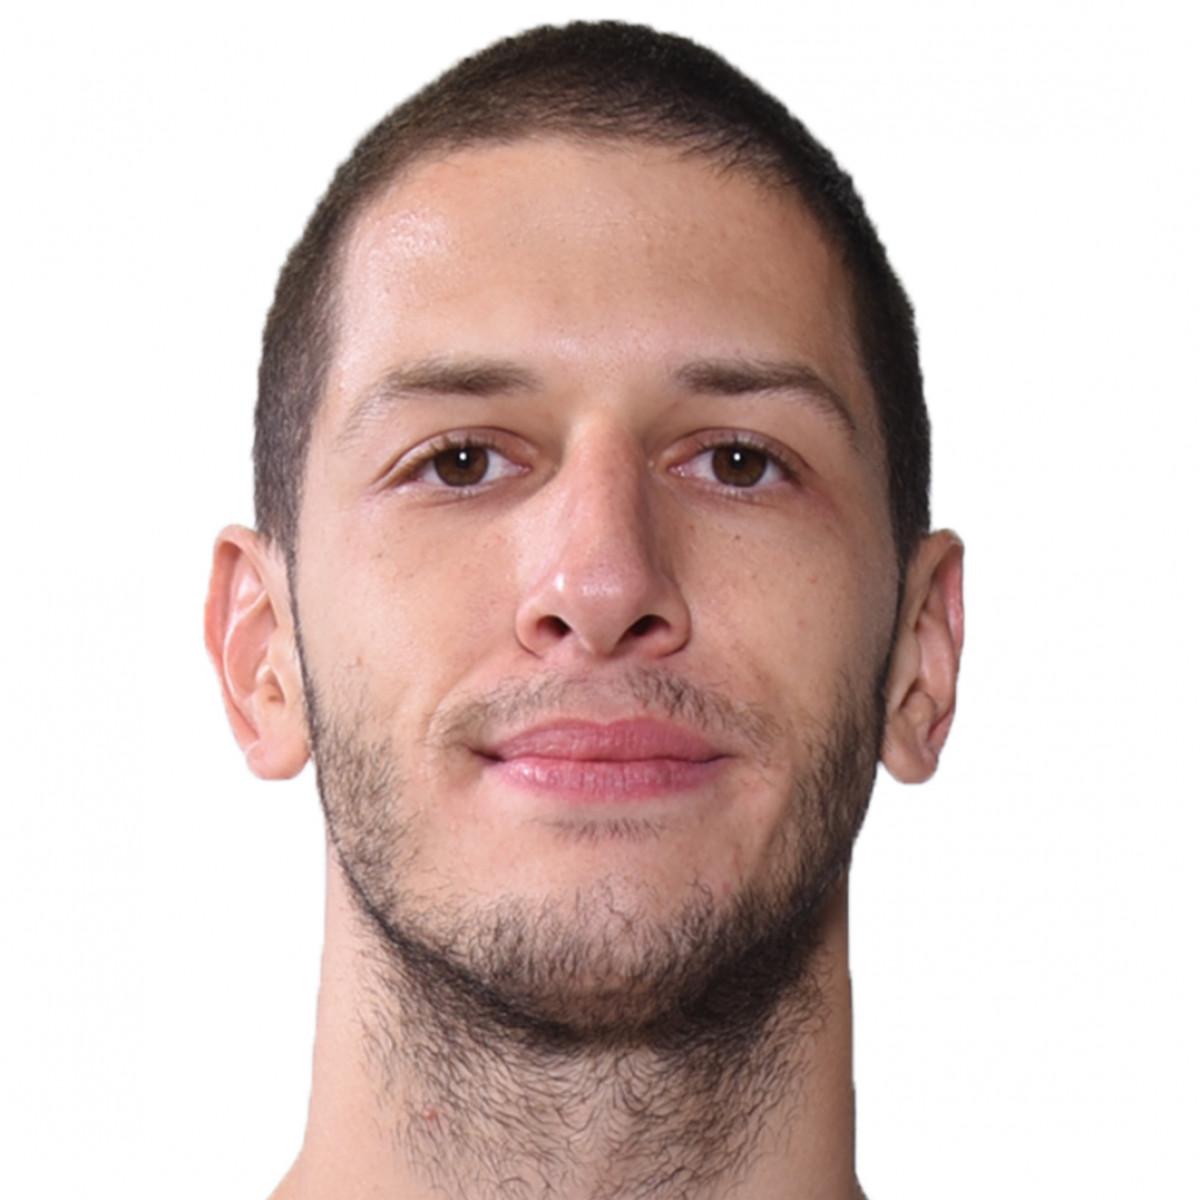 Nikola Ivanovic